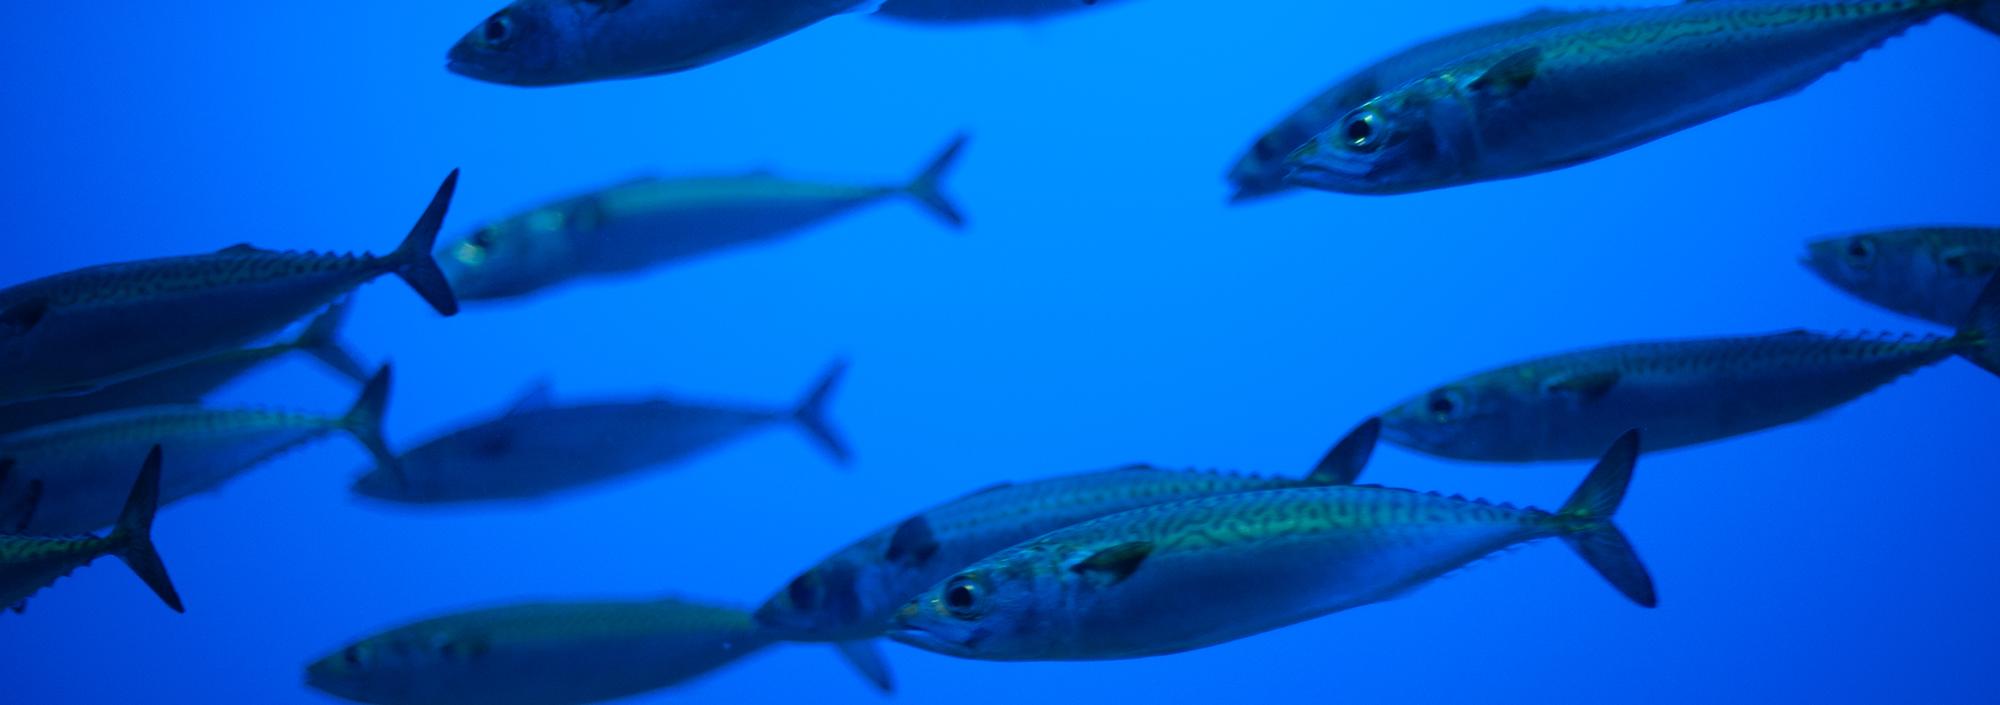 A school of Atlantic Mackerel swimming